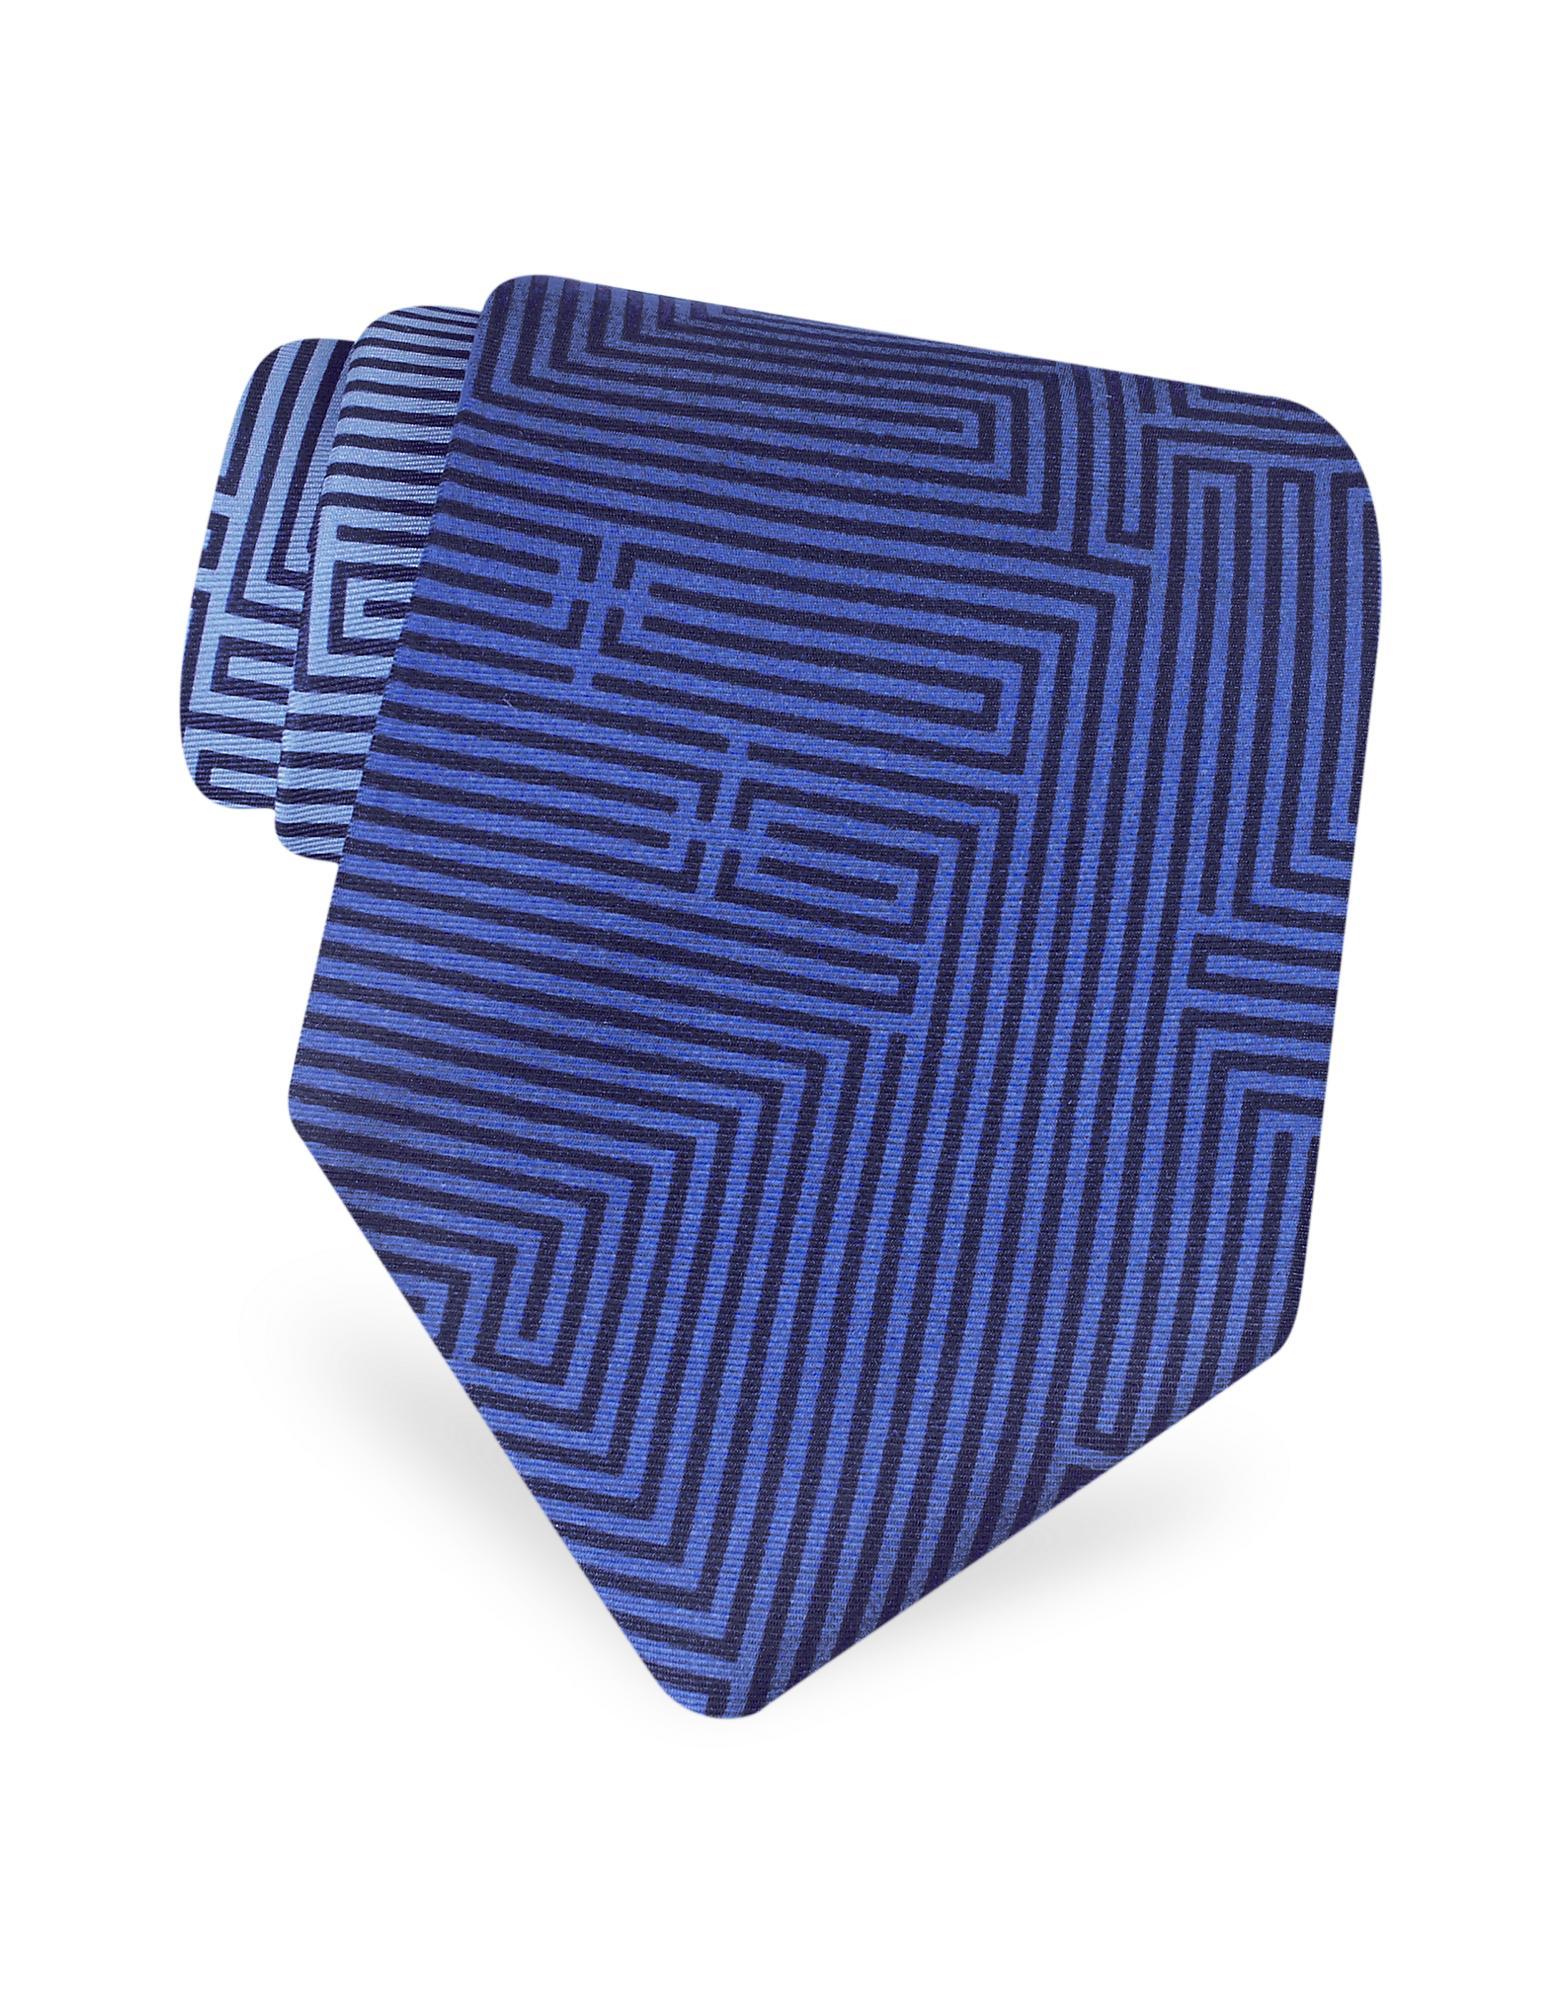 Fornasetti  Labirinto - Blue Geometric Lines Logoed Printed Silk Tie